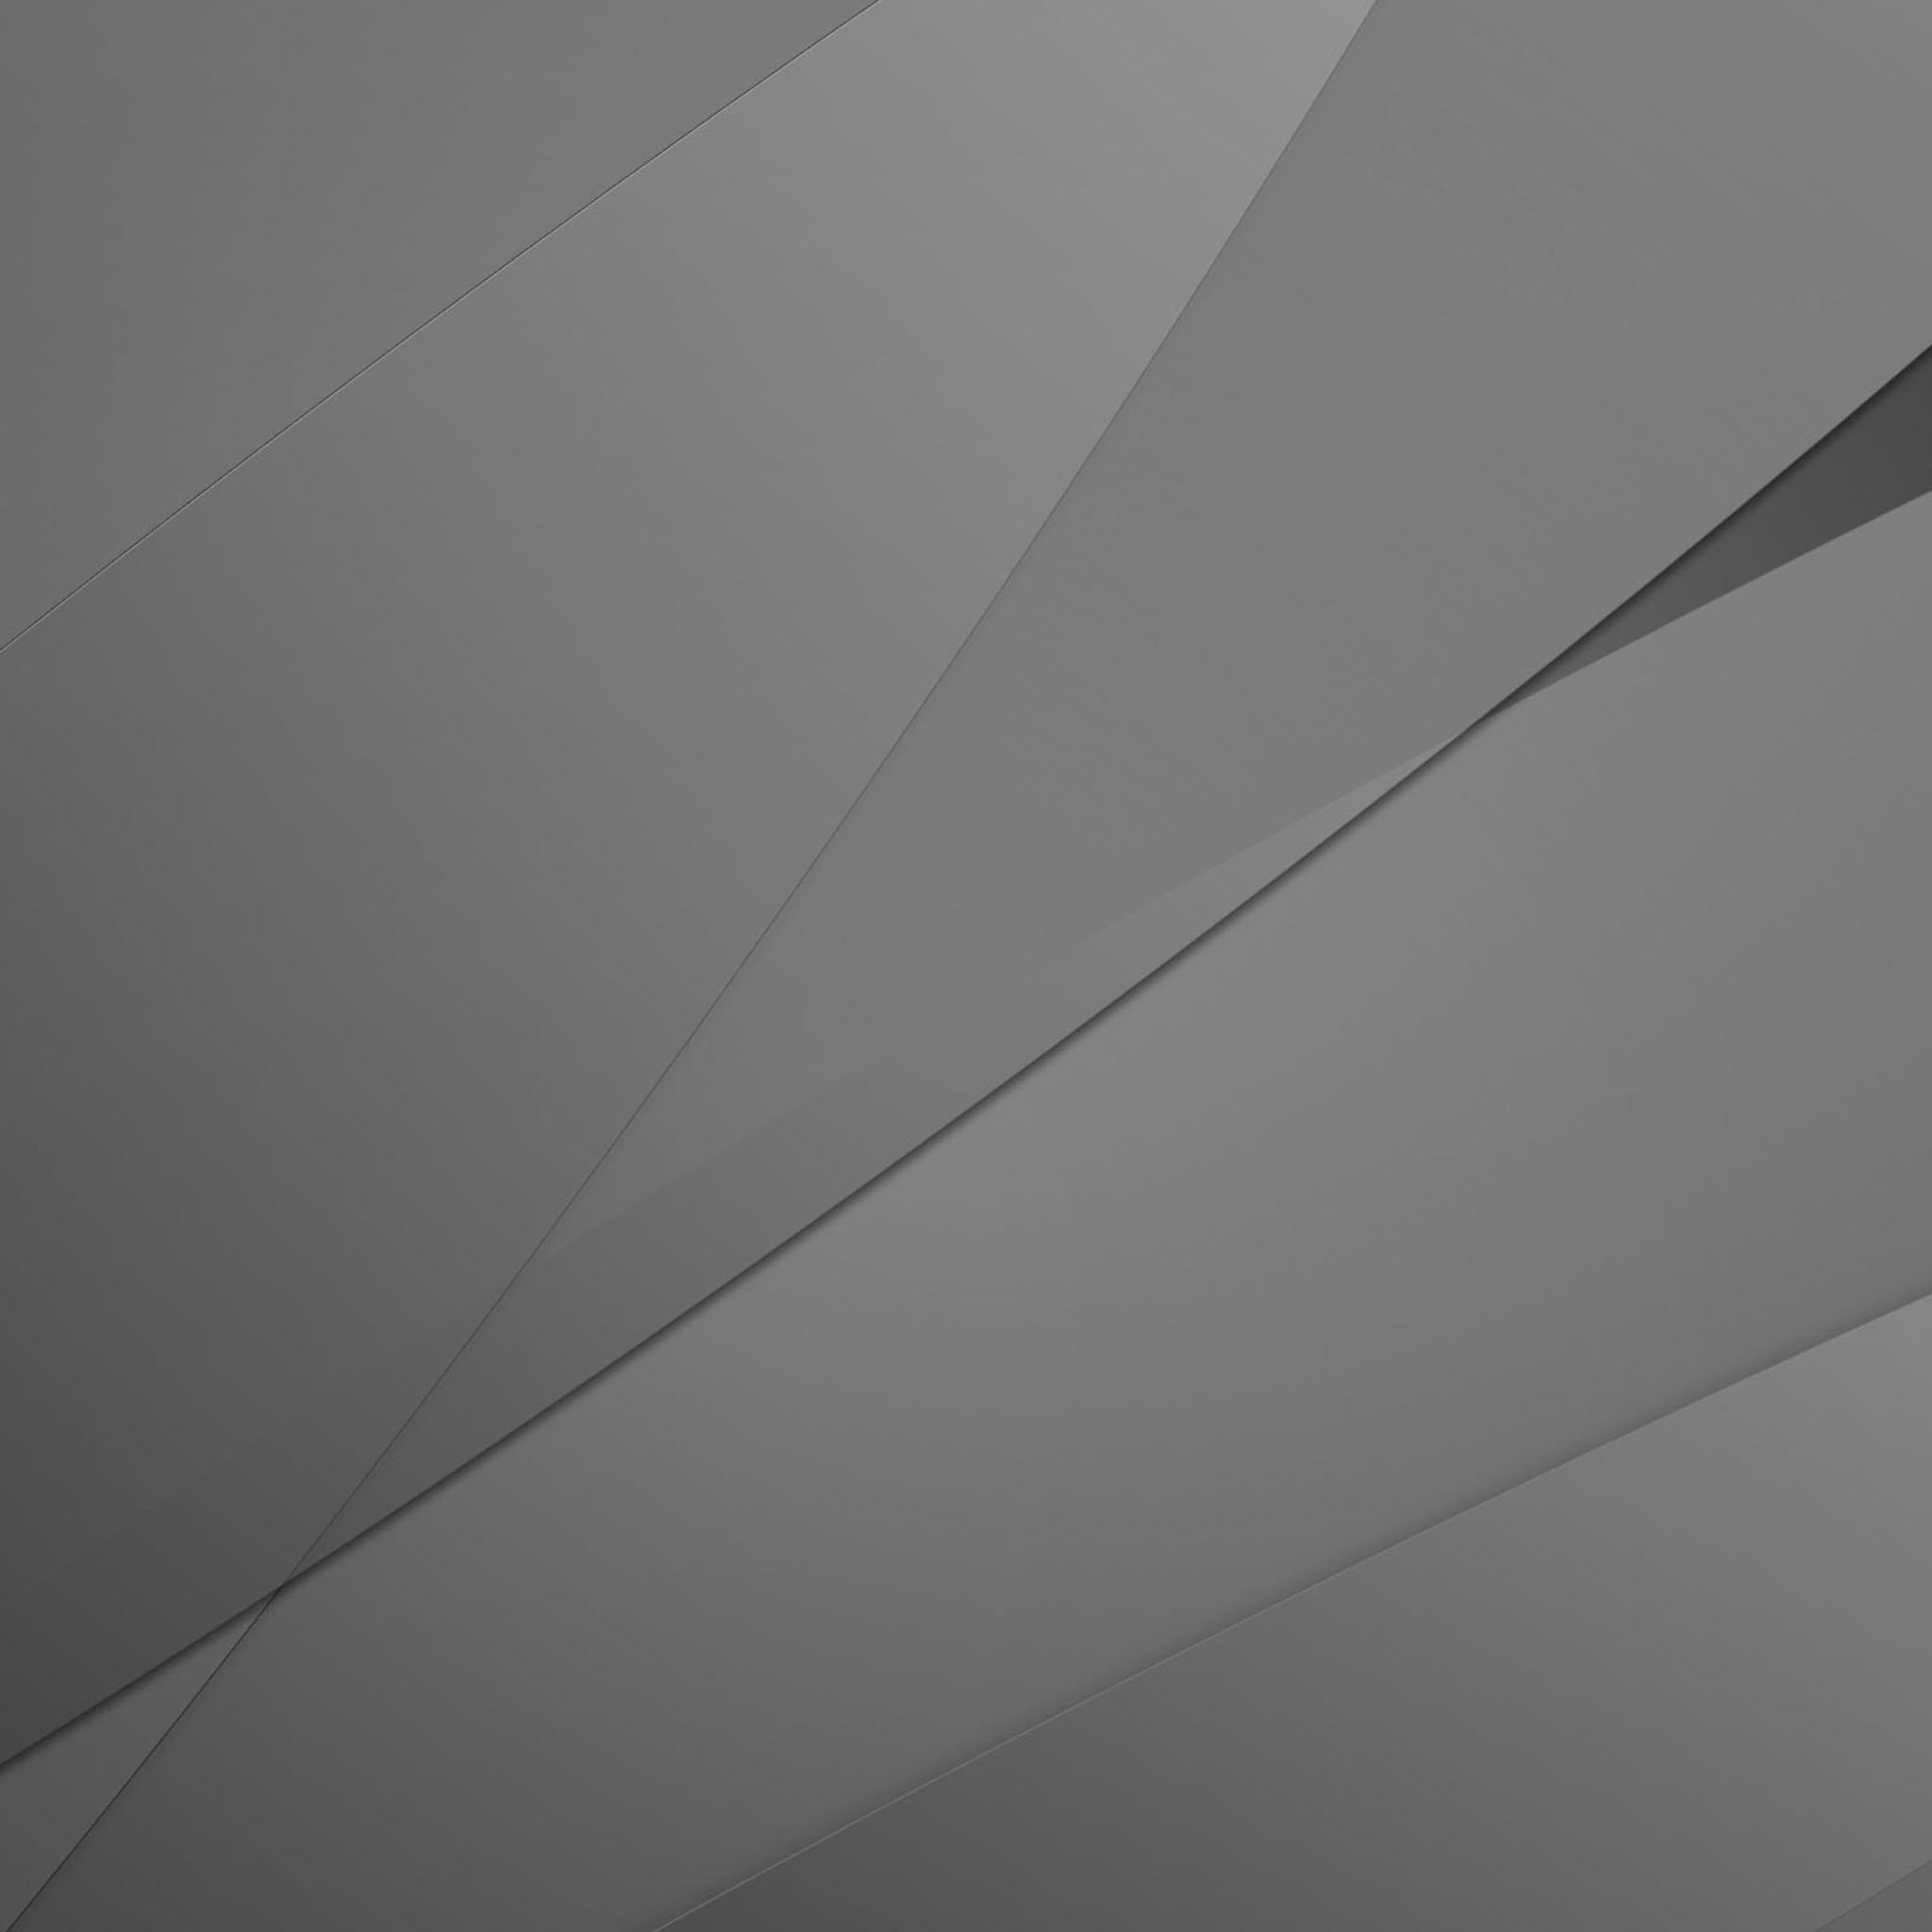 abstract-graphic-design-gray-ipad-desktop